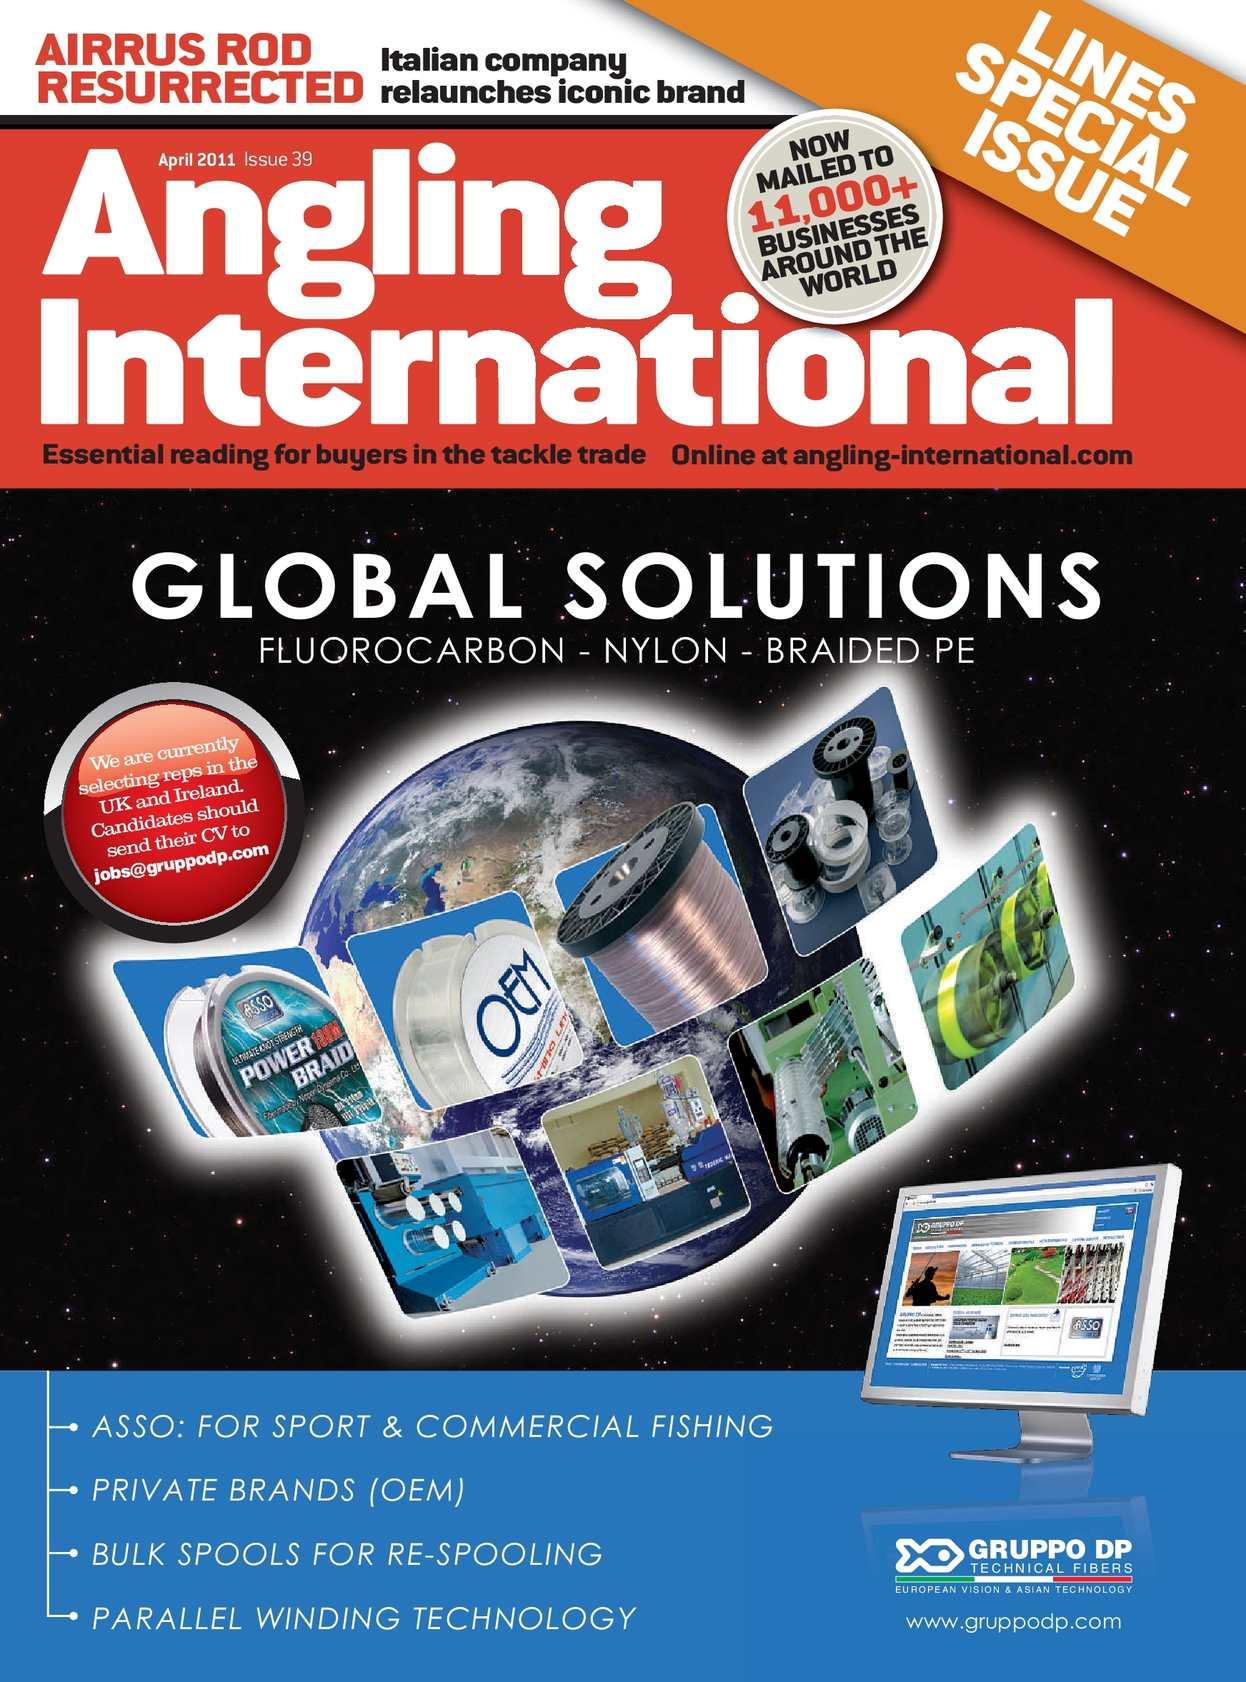 477b6c48621 Calaméo - Angling International - April 2011 - Issue 39